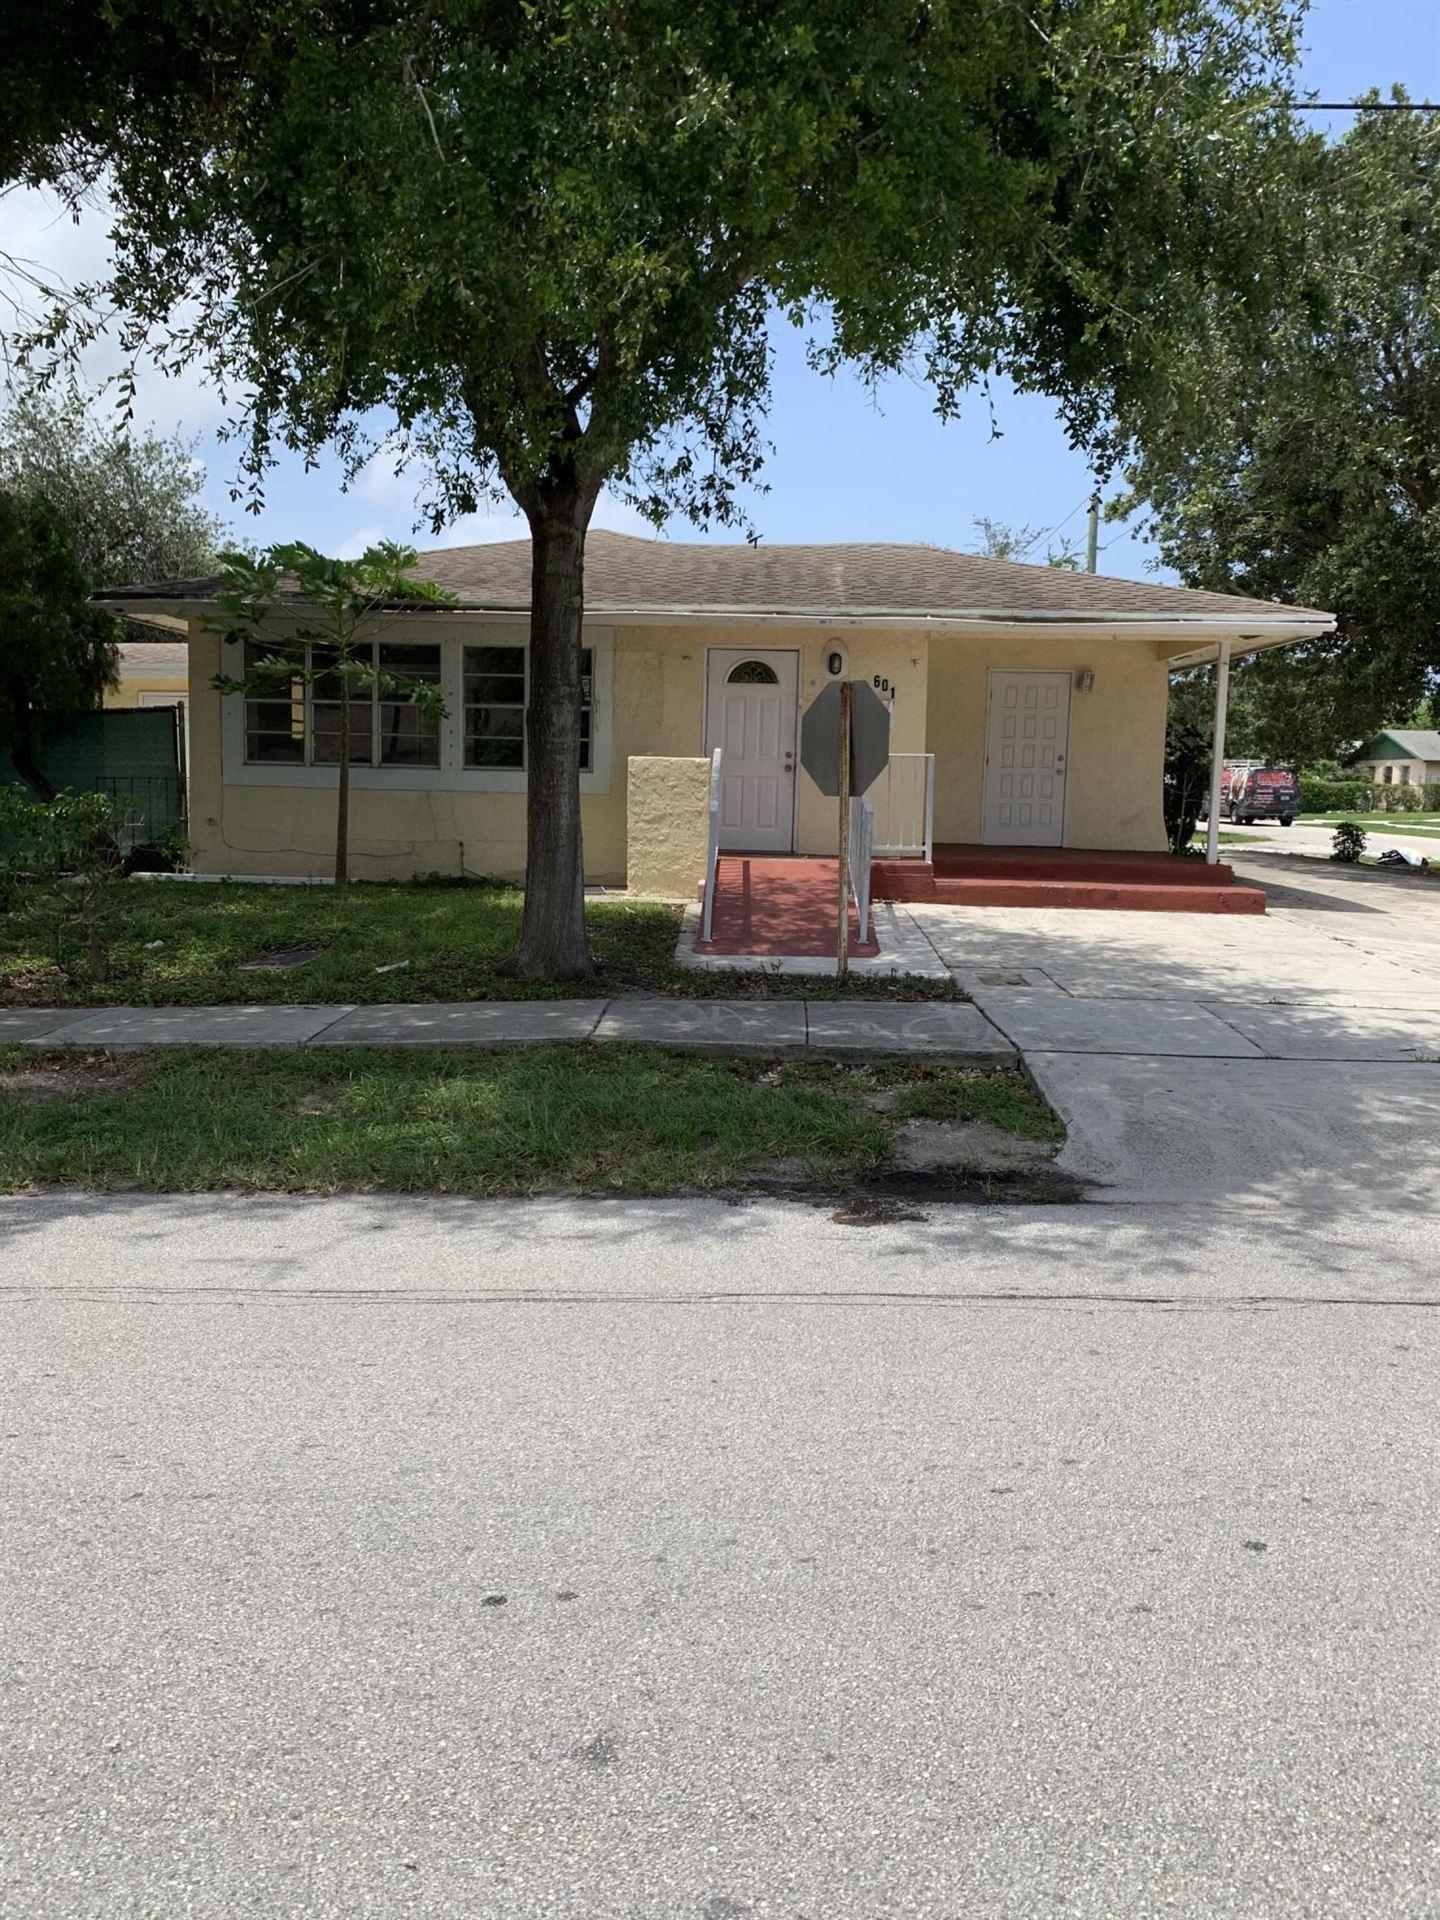 601 NW 2nd Street, Delray Beach, FL 33444 - #: RX-10625979